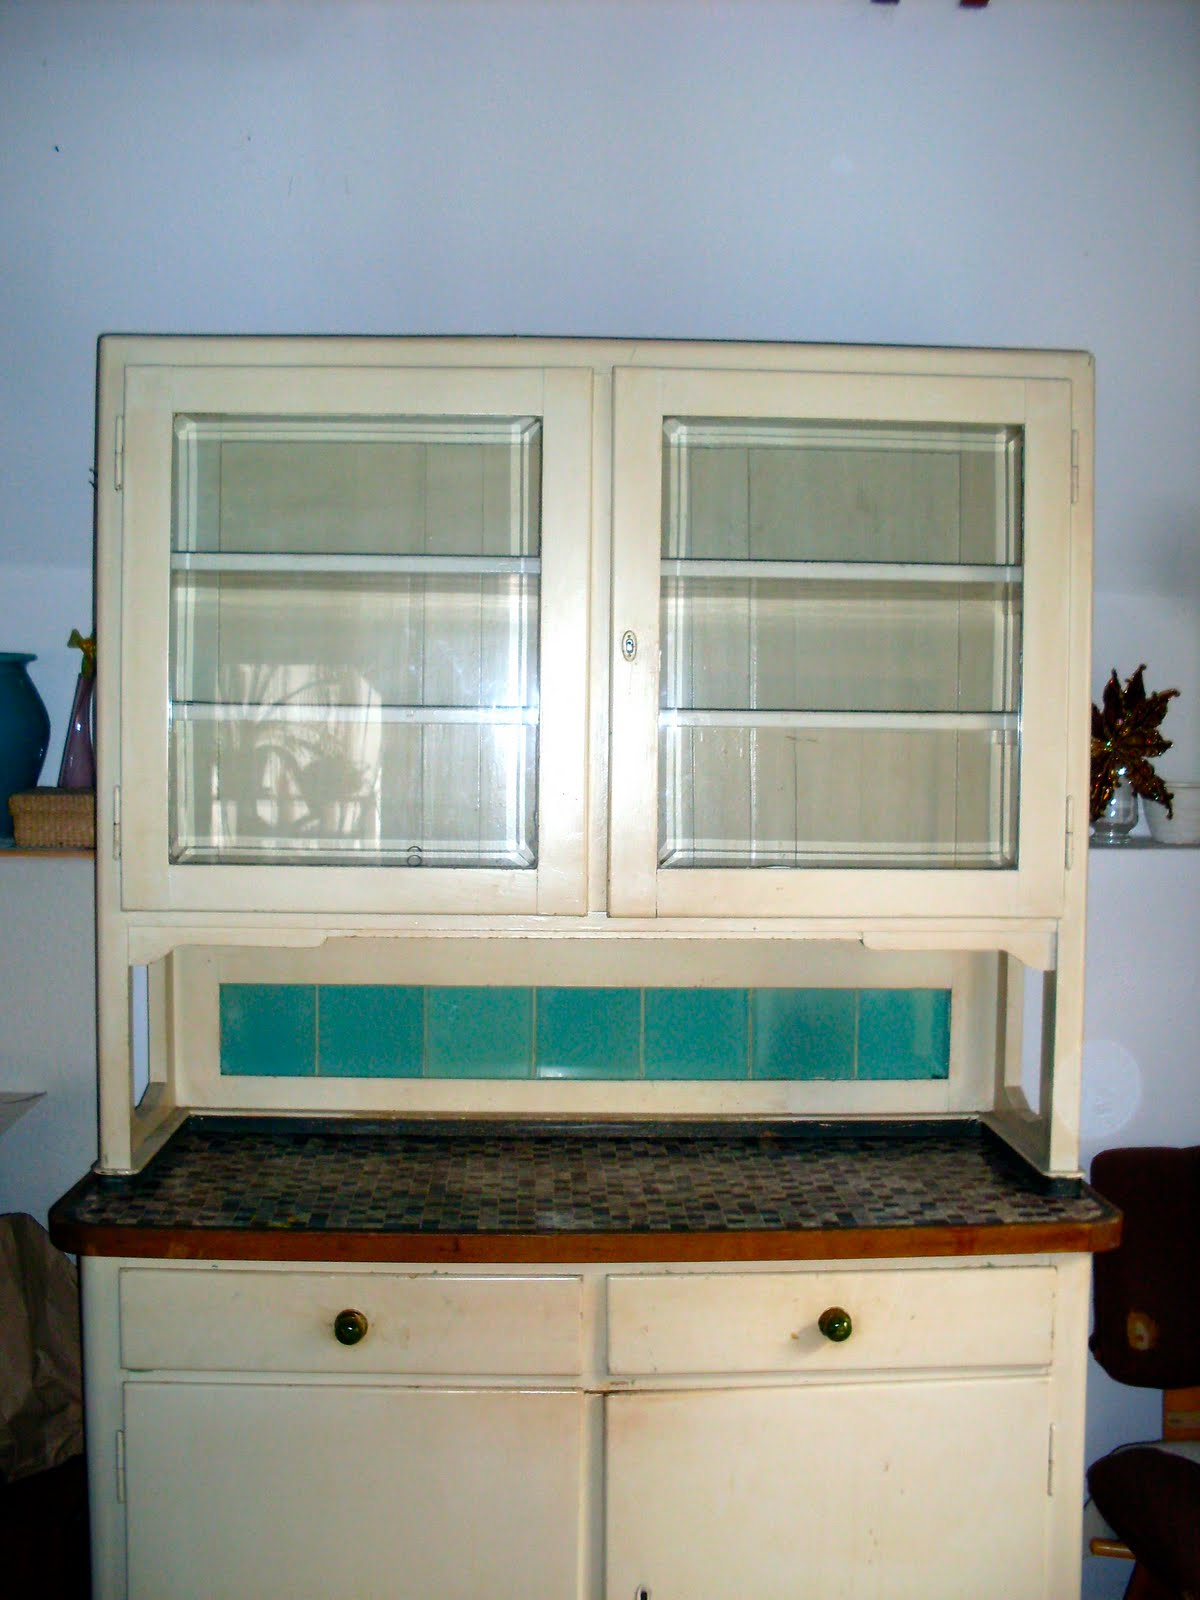 inspirationflor aus alt mach neu. Black Bedroom Furniture Sets. Home Design Ideas